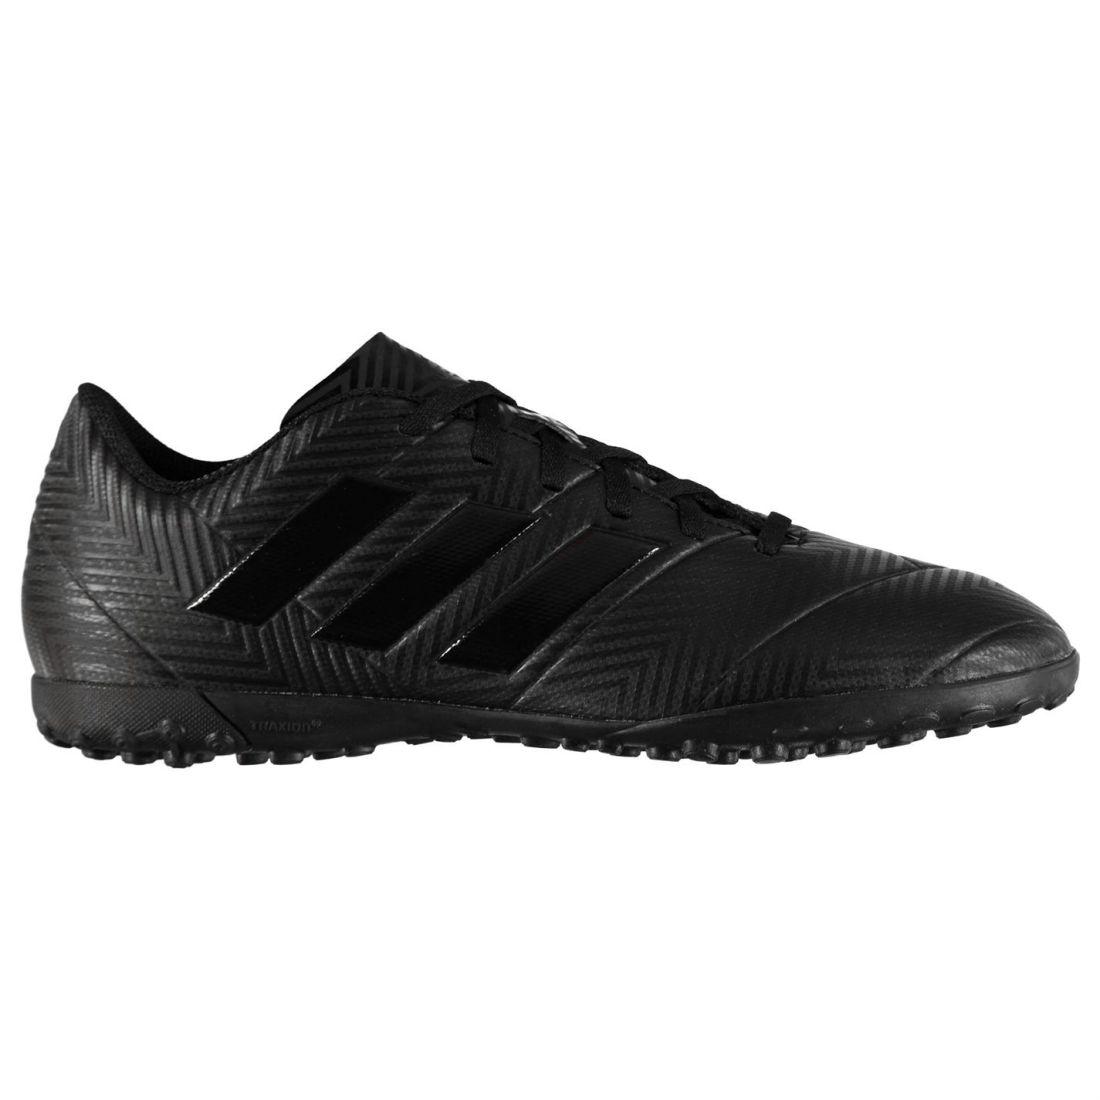 8a6b991ced6c adidas Nemeziz Tango 18.4 Astro Turf Sneakers Mens Gents Football Boots  Laces